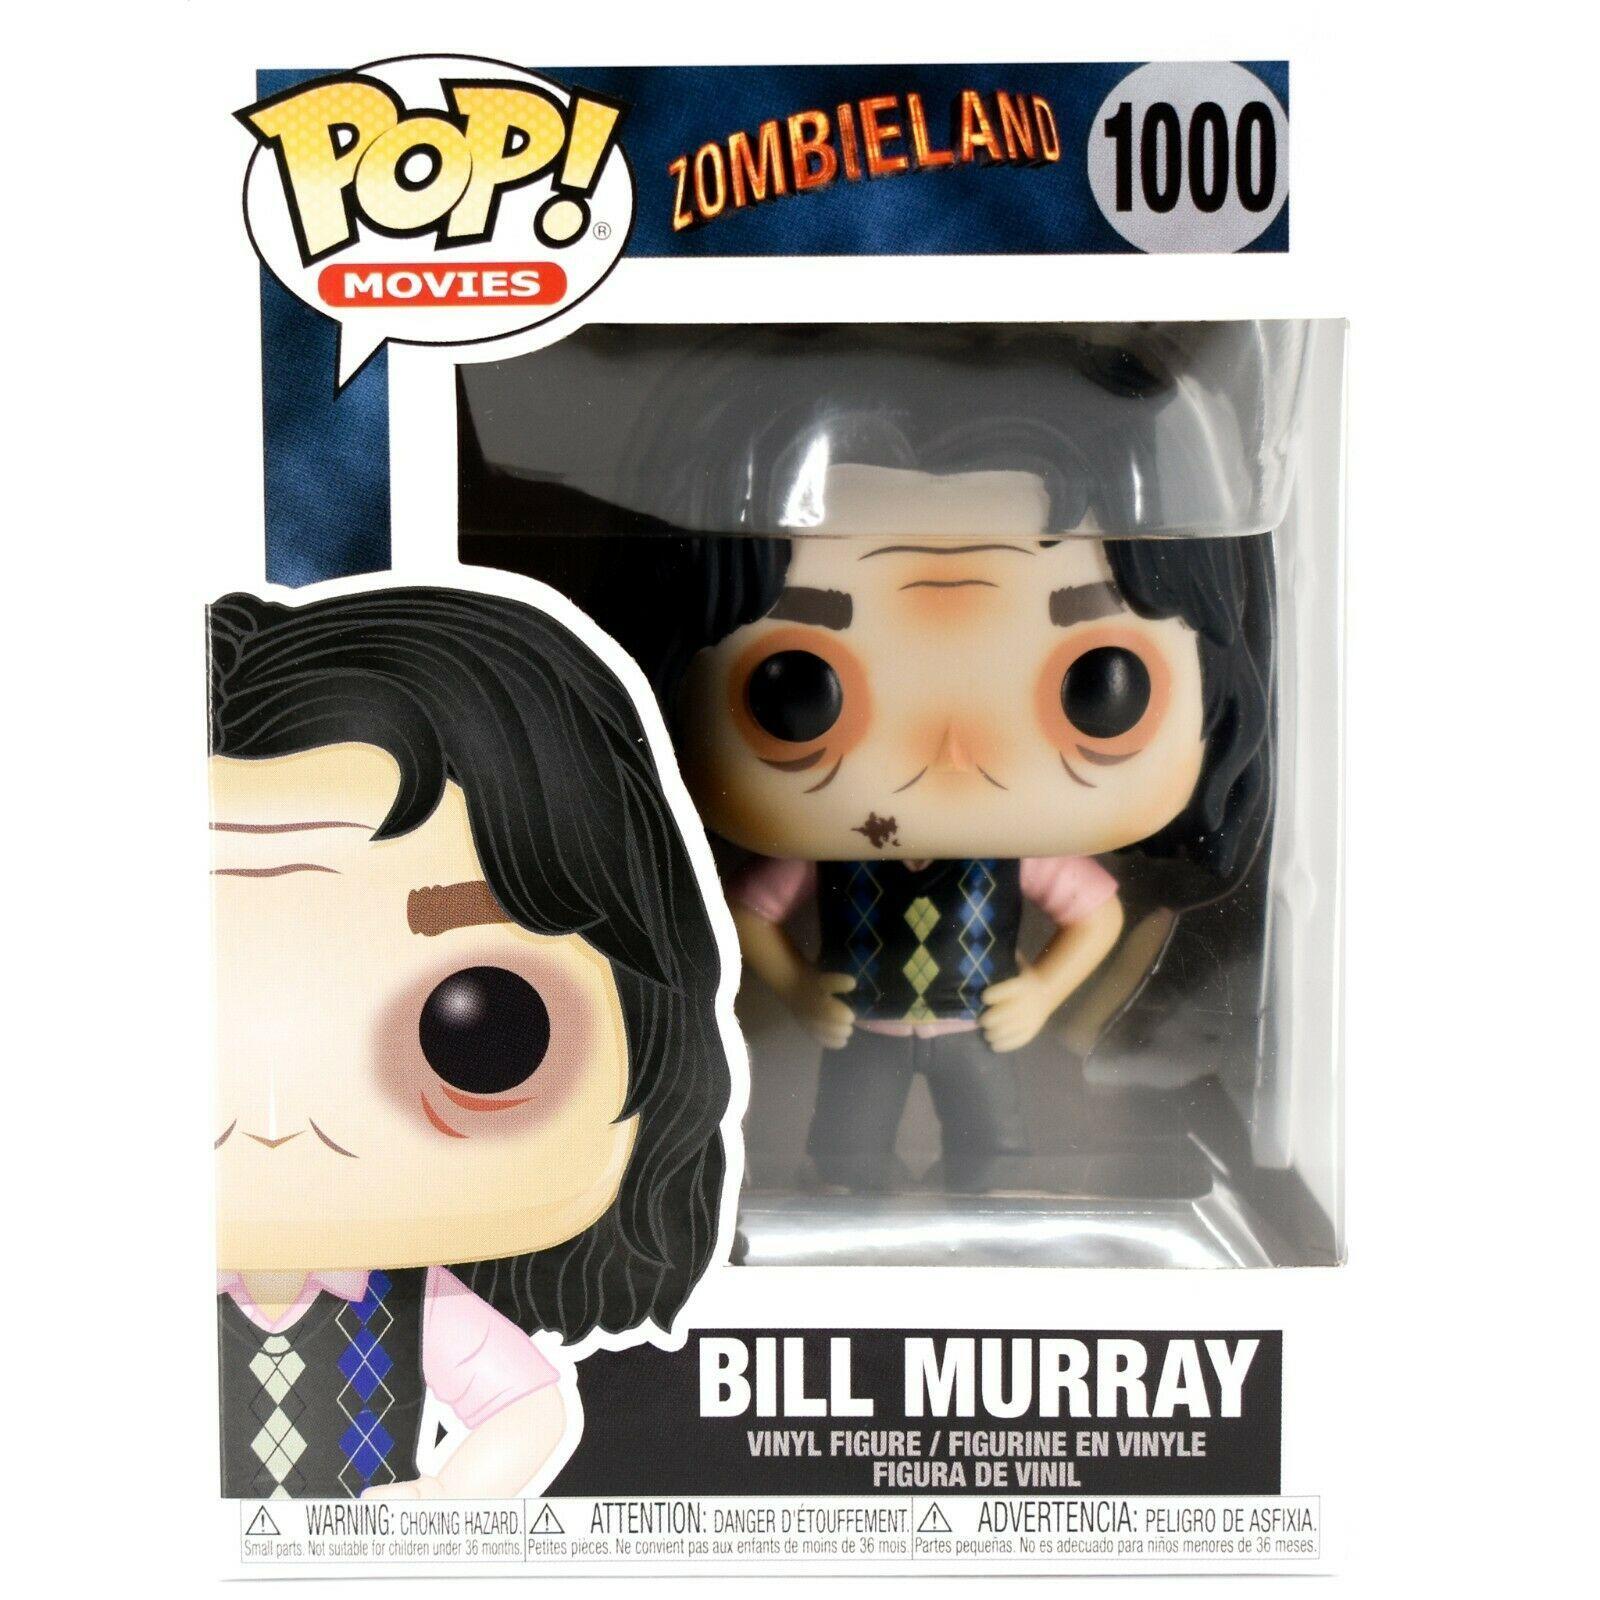 Funko Pop! Movies Zombieland Bill Murray #1000 Vinyl Action Figure